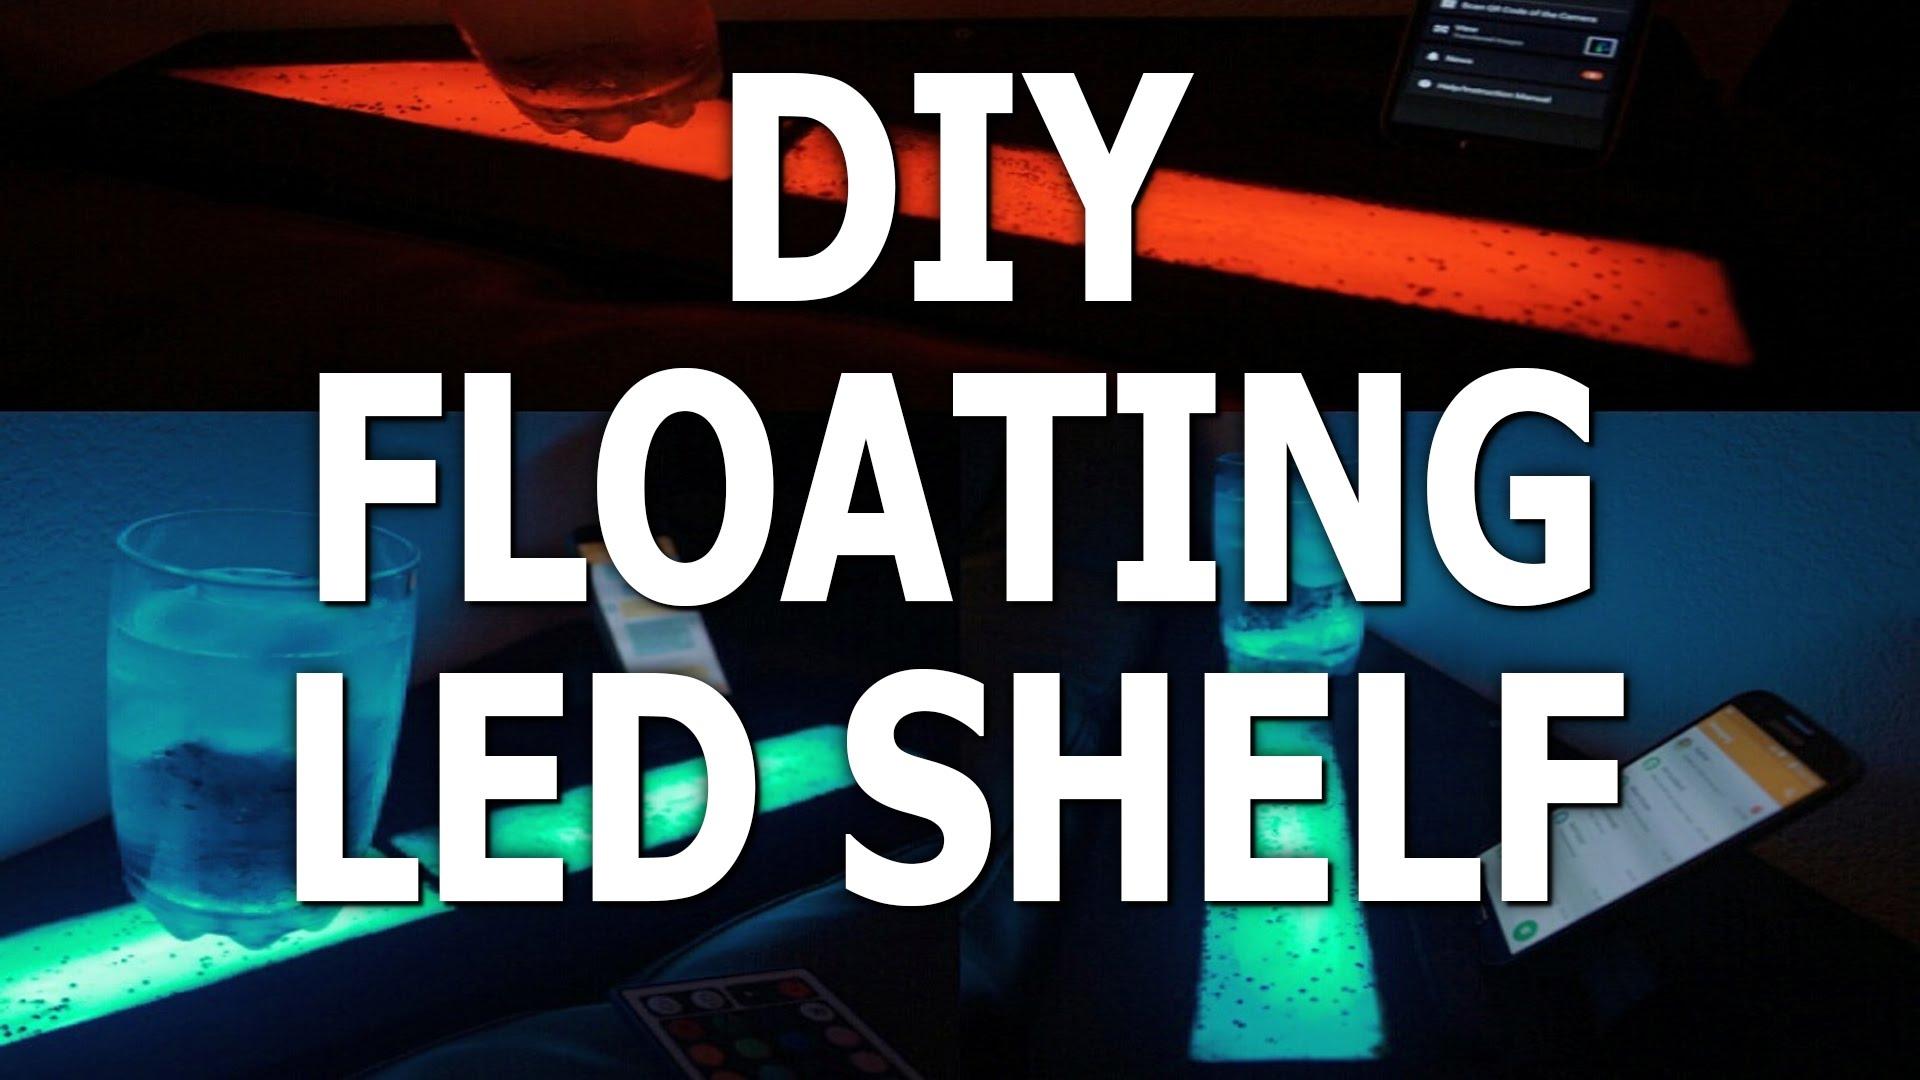 Led Strip Floating Shelf Furniture Lighting Youtube Pertaining To Led Floating Shelves (View 11 of 15)